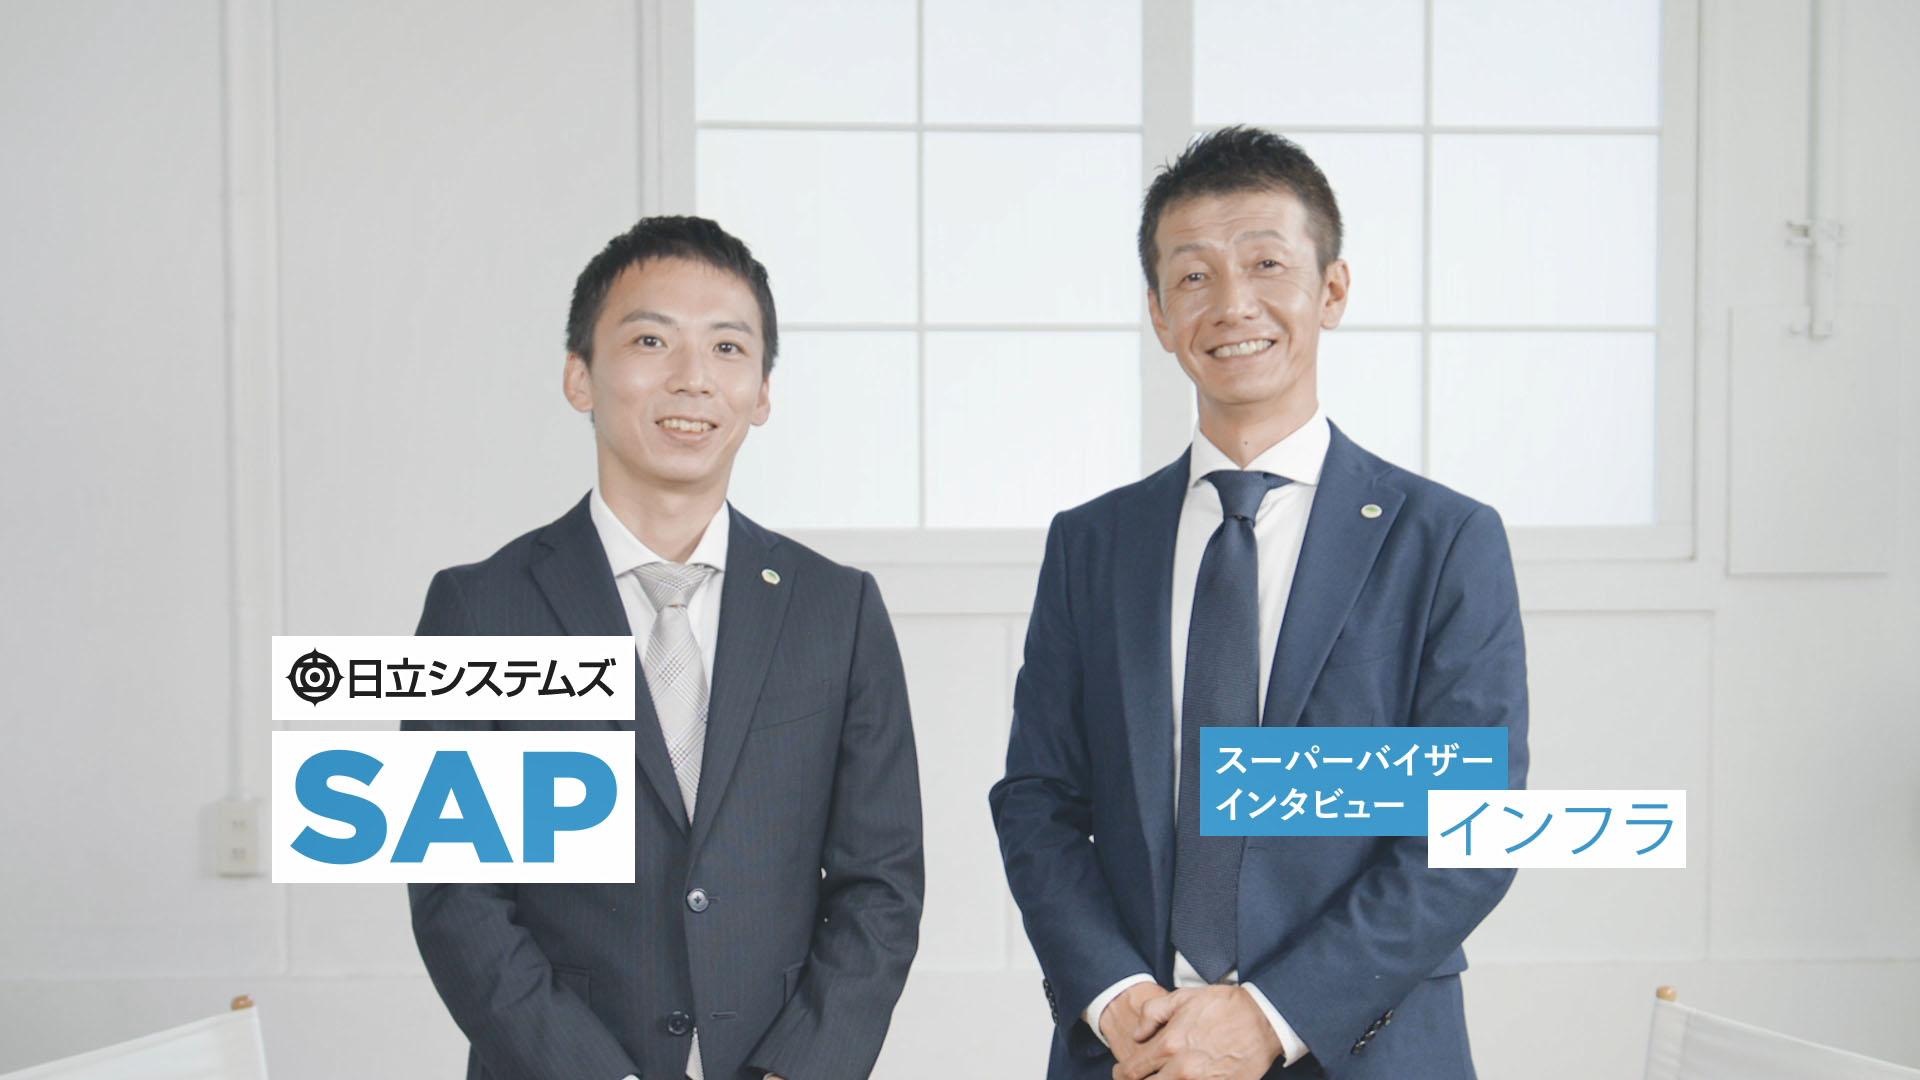 SAP S/4HANA スーパーバイザーインタビュー インフラ編